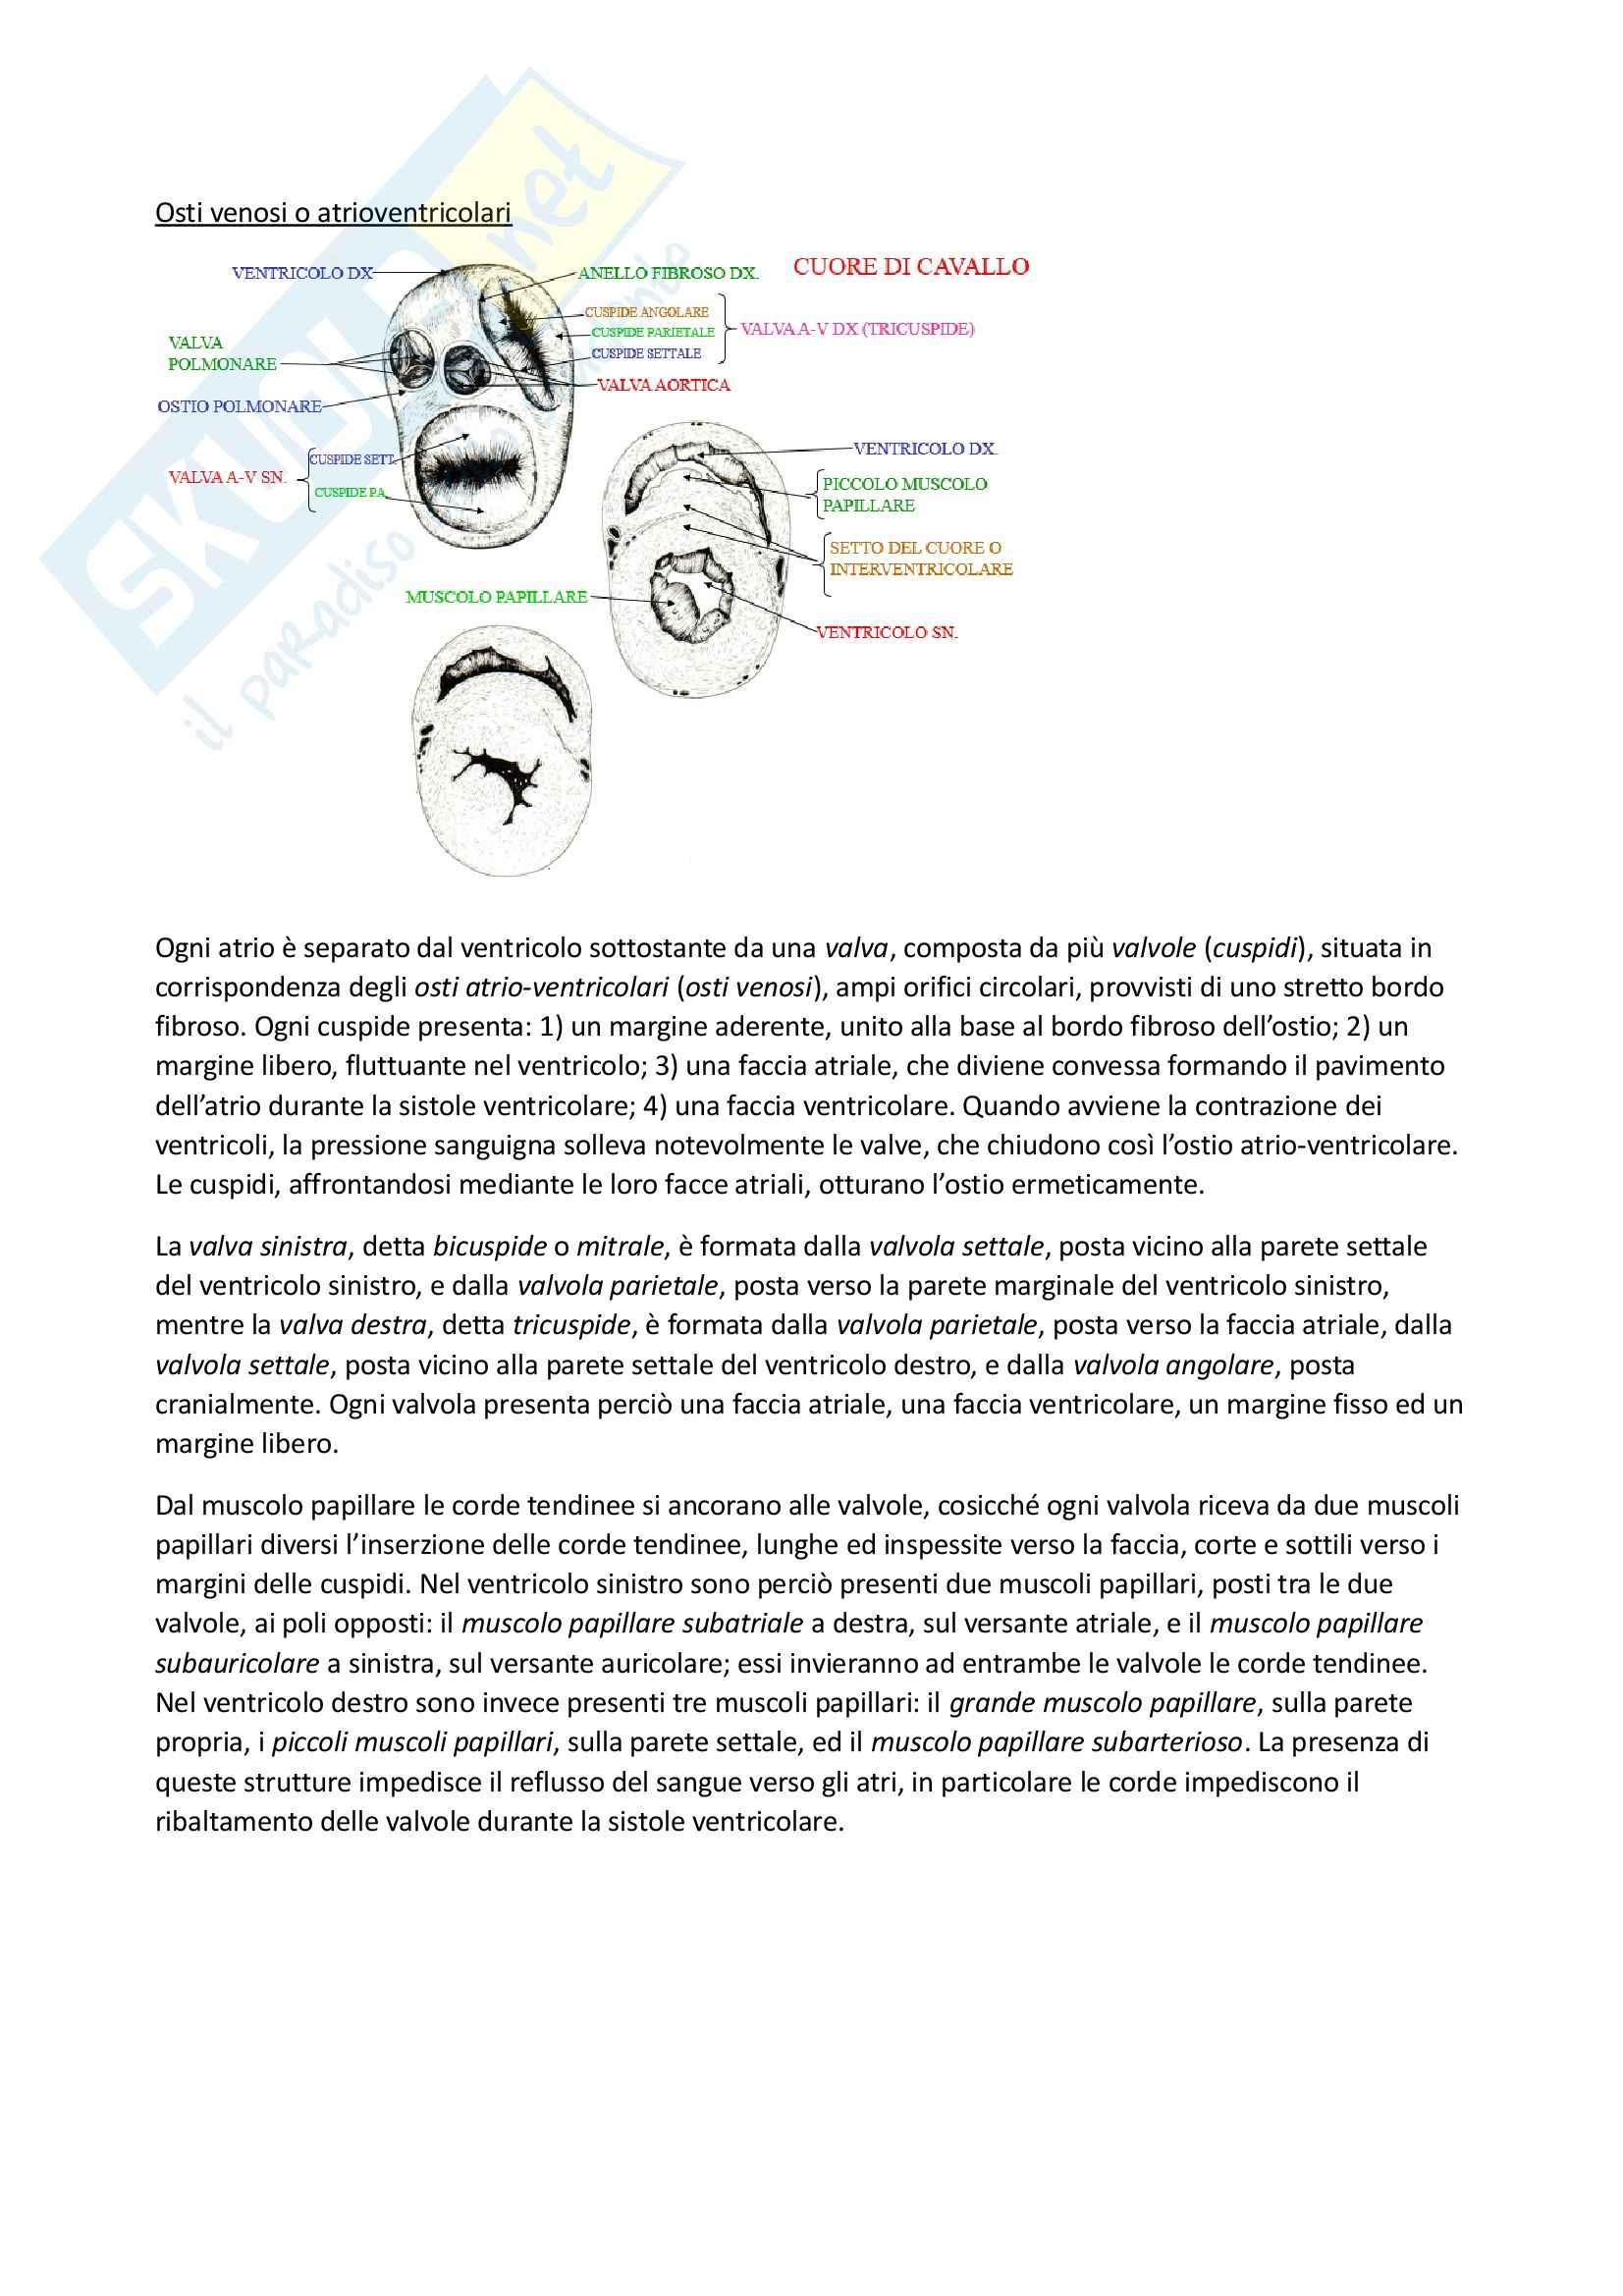 Apparato Cardiocircolatorio, Anatomia comparata Pag. 16